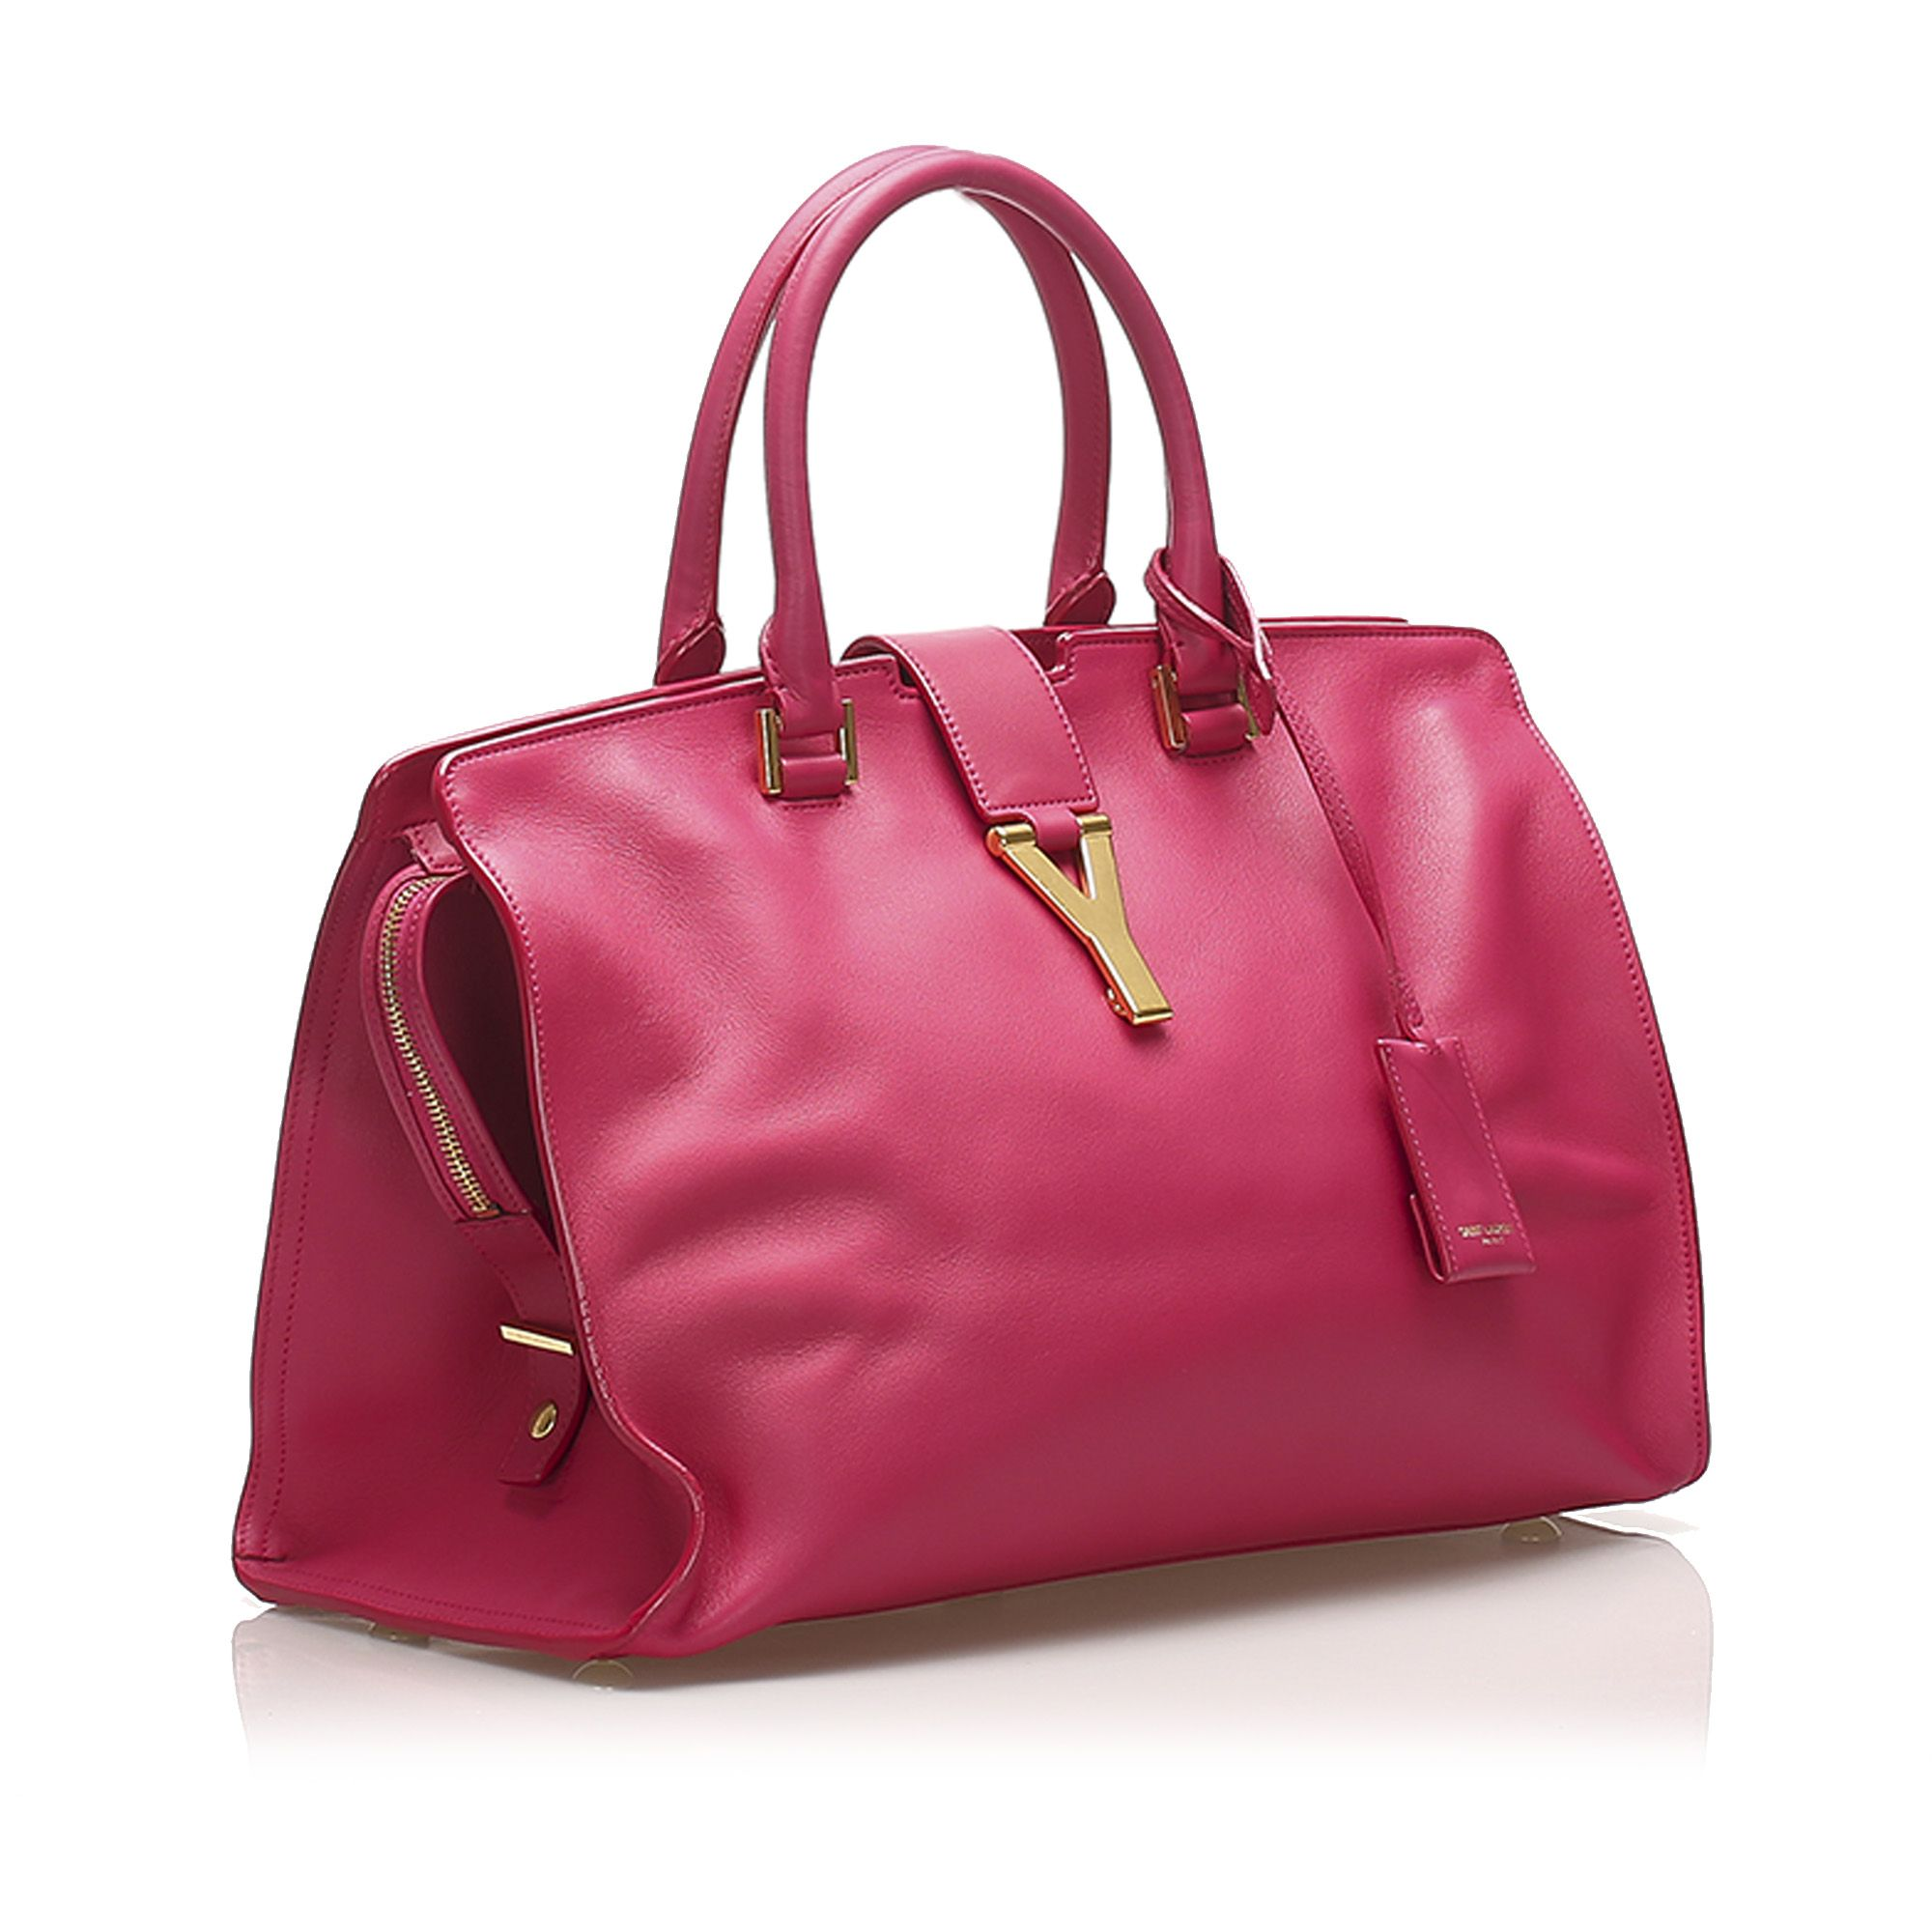 Vintage YSL Cabas Chyc Leather Satchel Pink